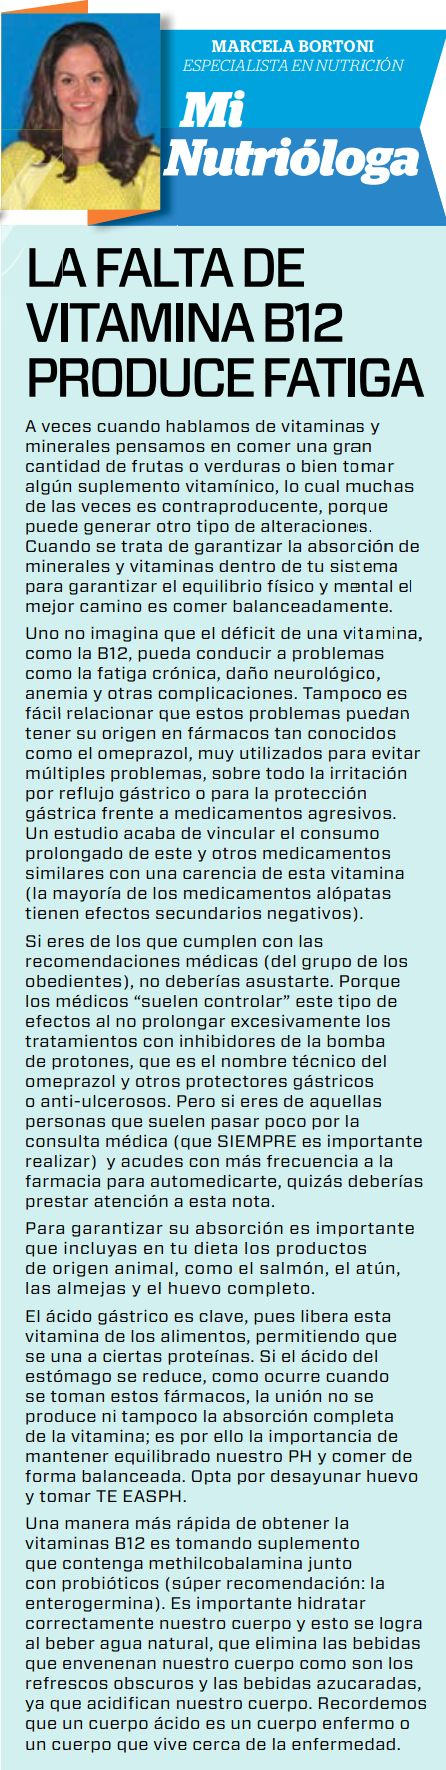 Periódico EL Horizonte La falta de vitamina B12 produce fatiga.